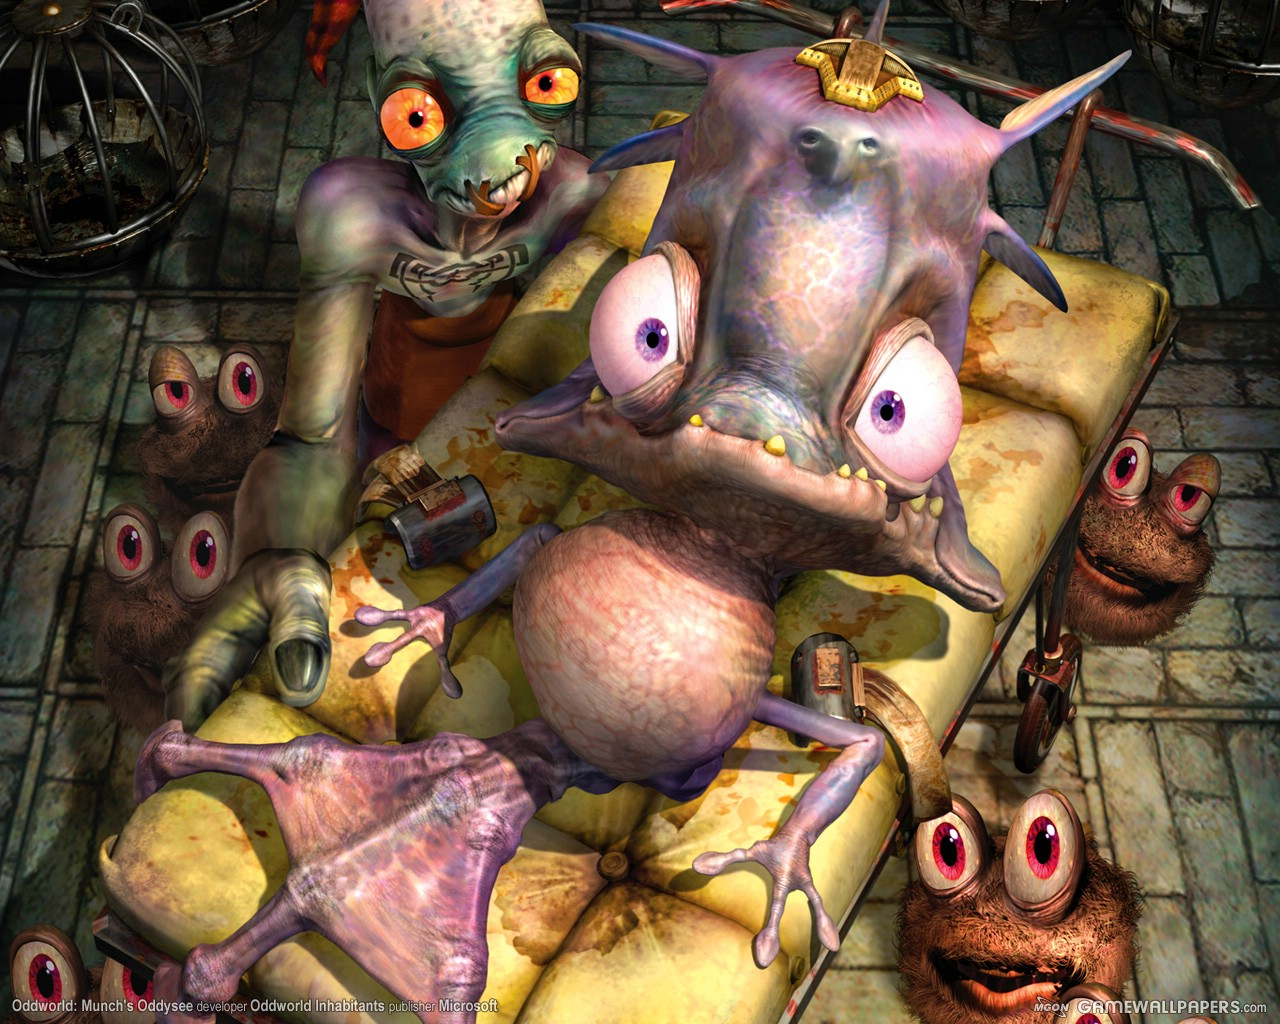 Oddworld munchs oddysee pc free download